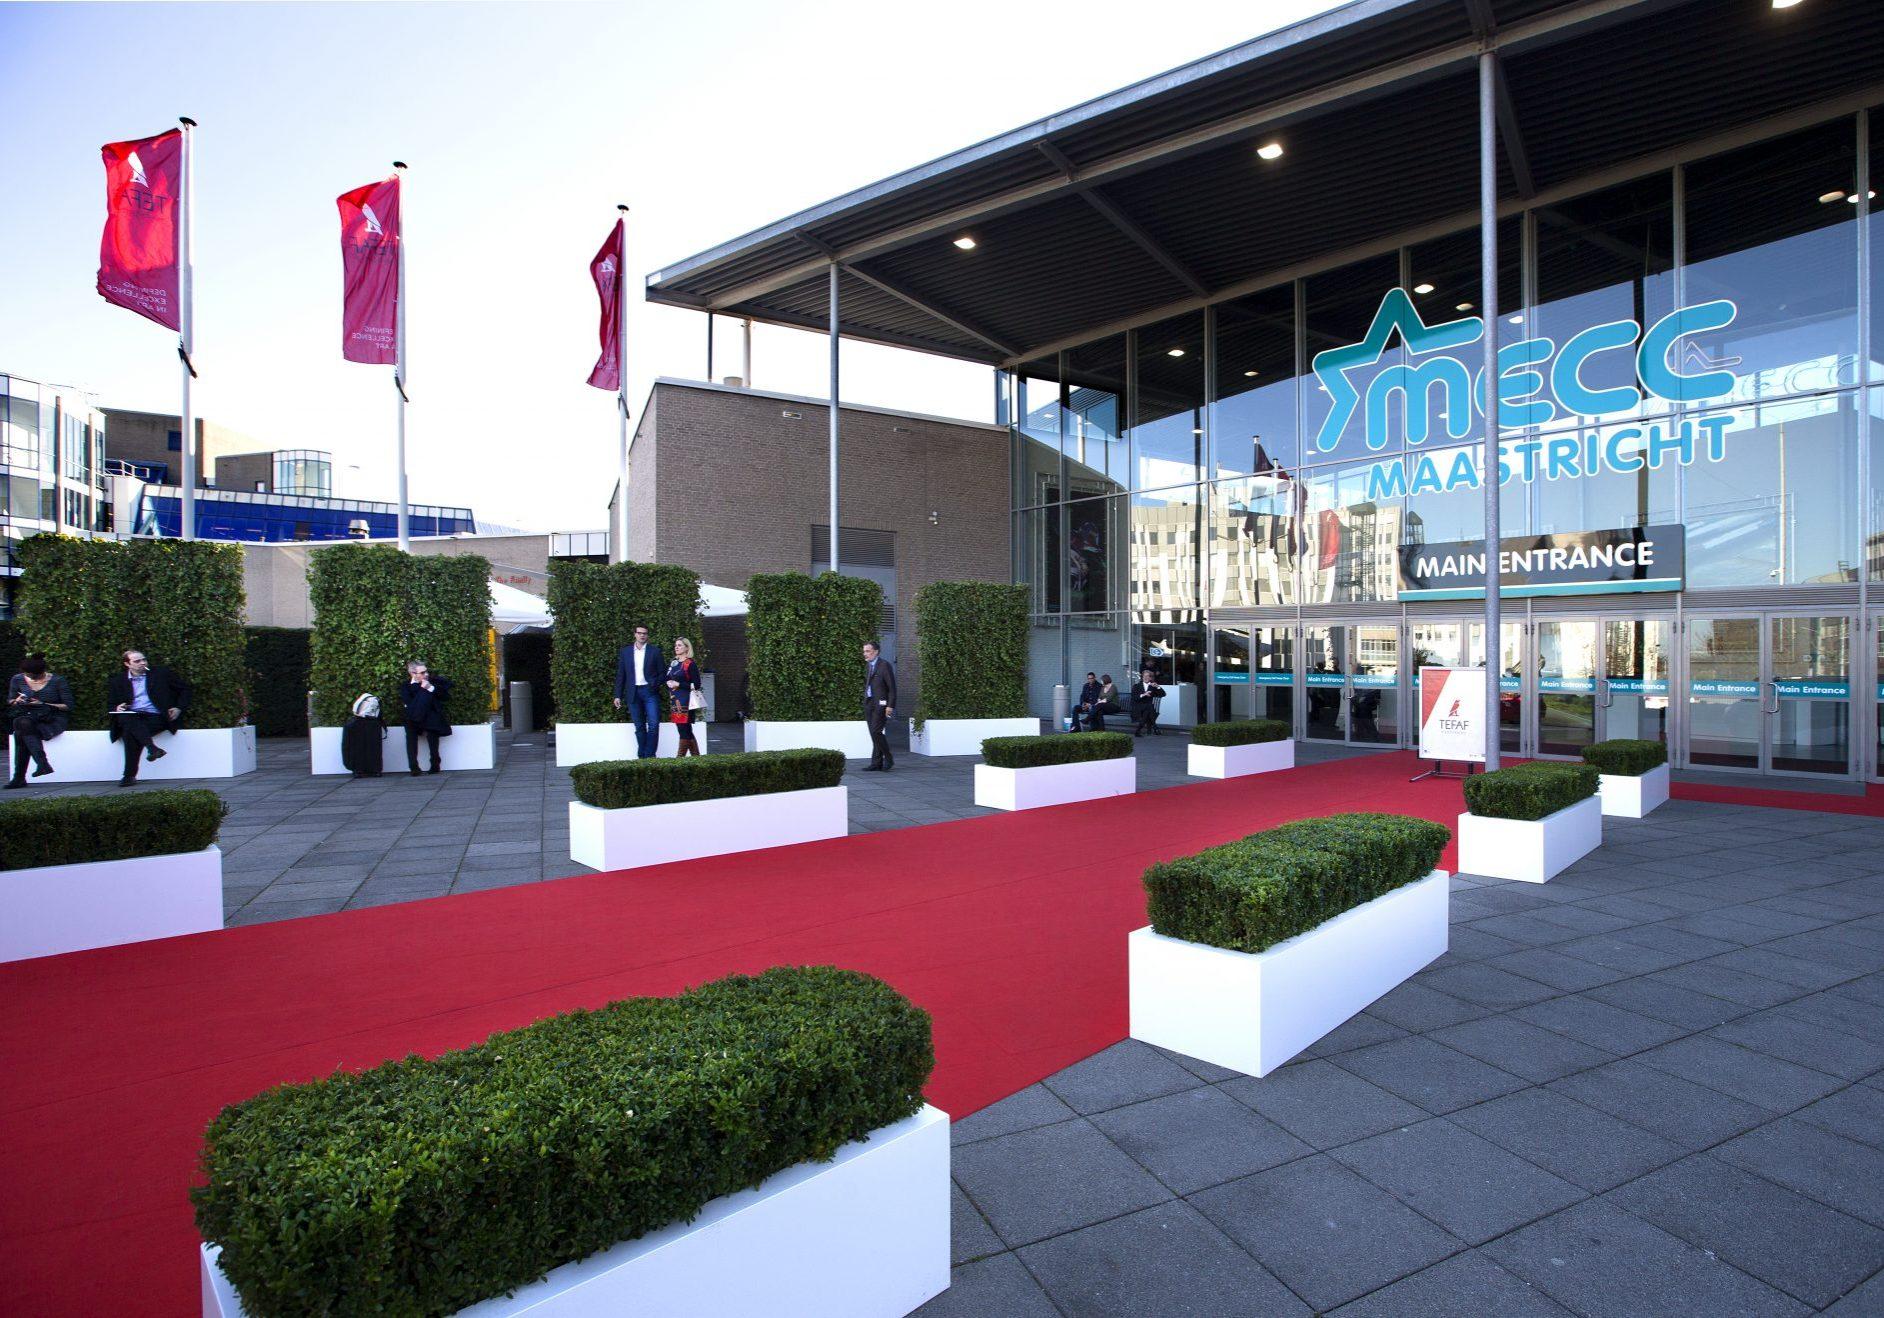 MECC Maastricht Exterieur Entree 5